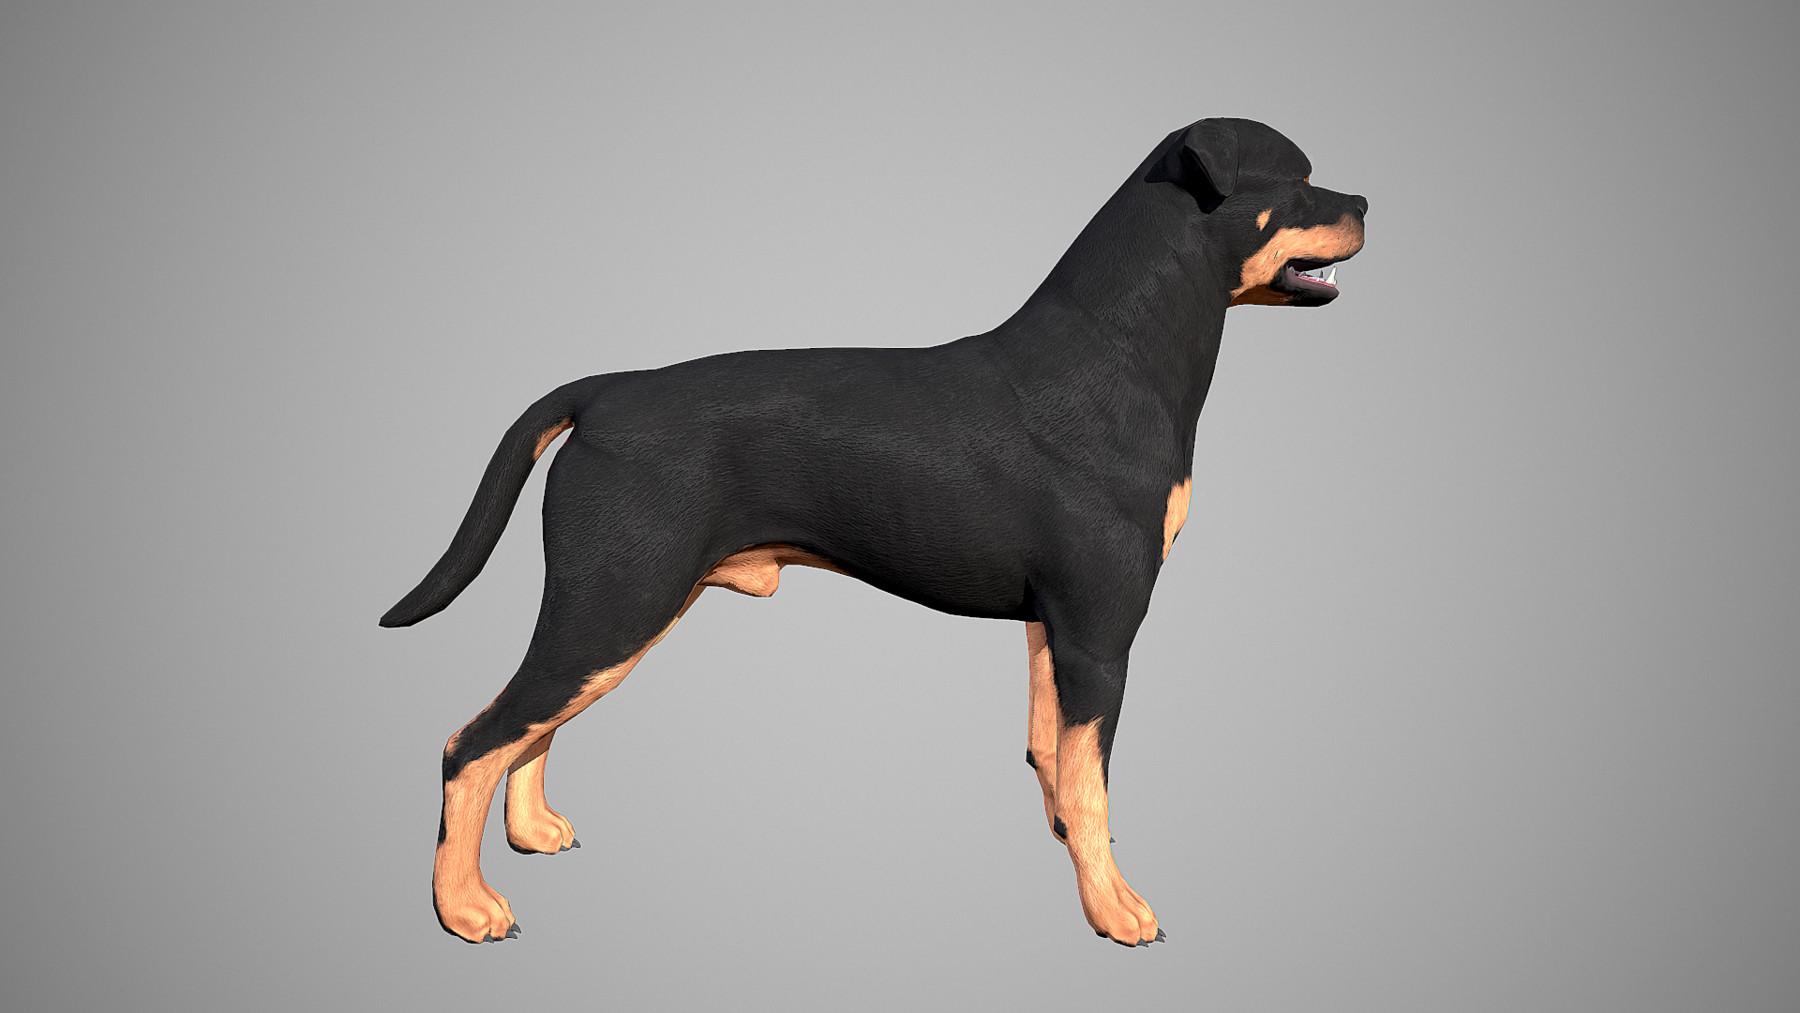 Rottweiler by alexlashko marmoset 18